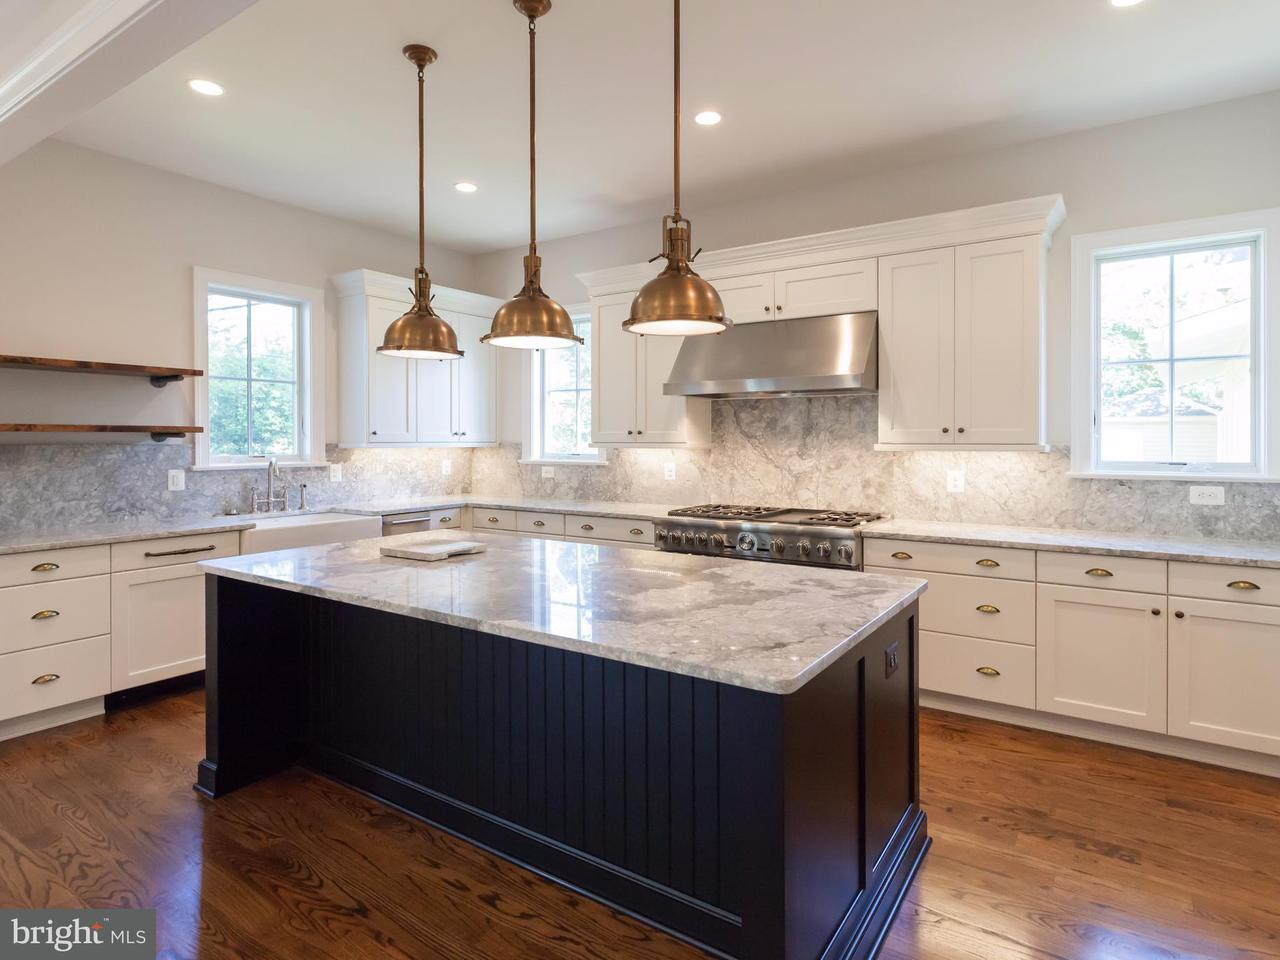 Single Family Home for Sale at 1723 BARTON ST N 1723 BARTON ST N Arlington, Virginia 22201 United States